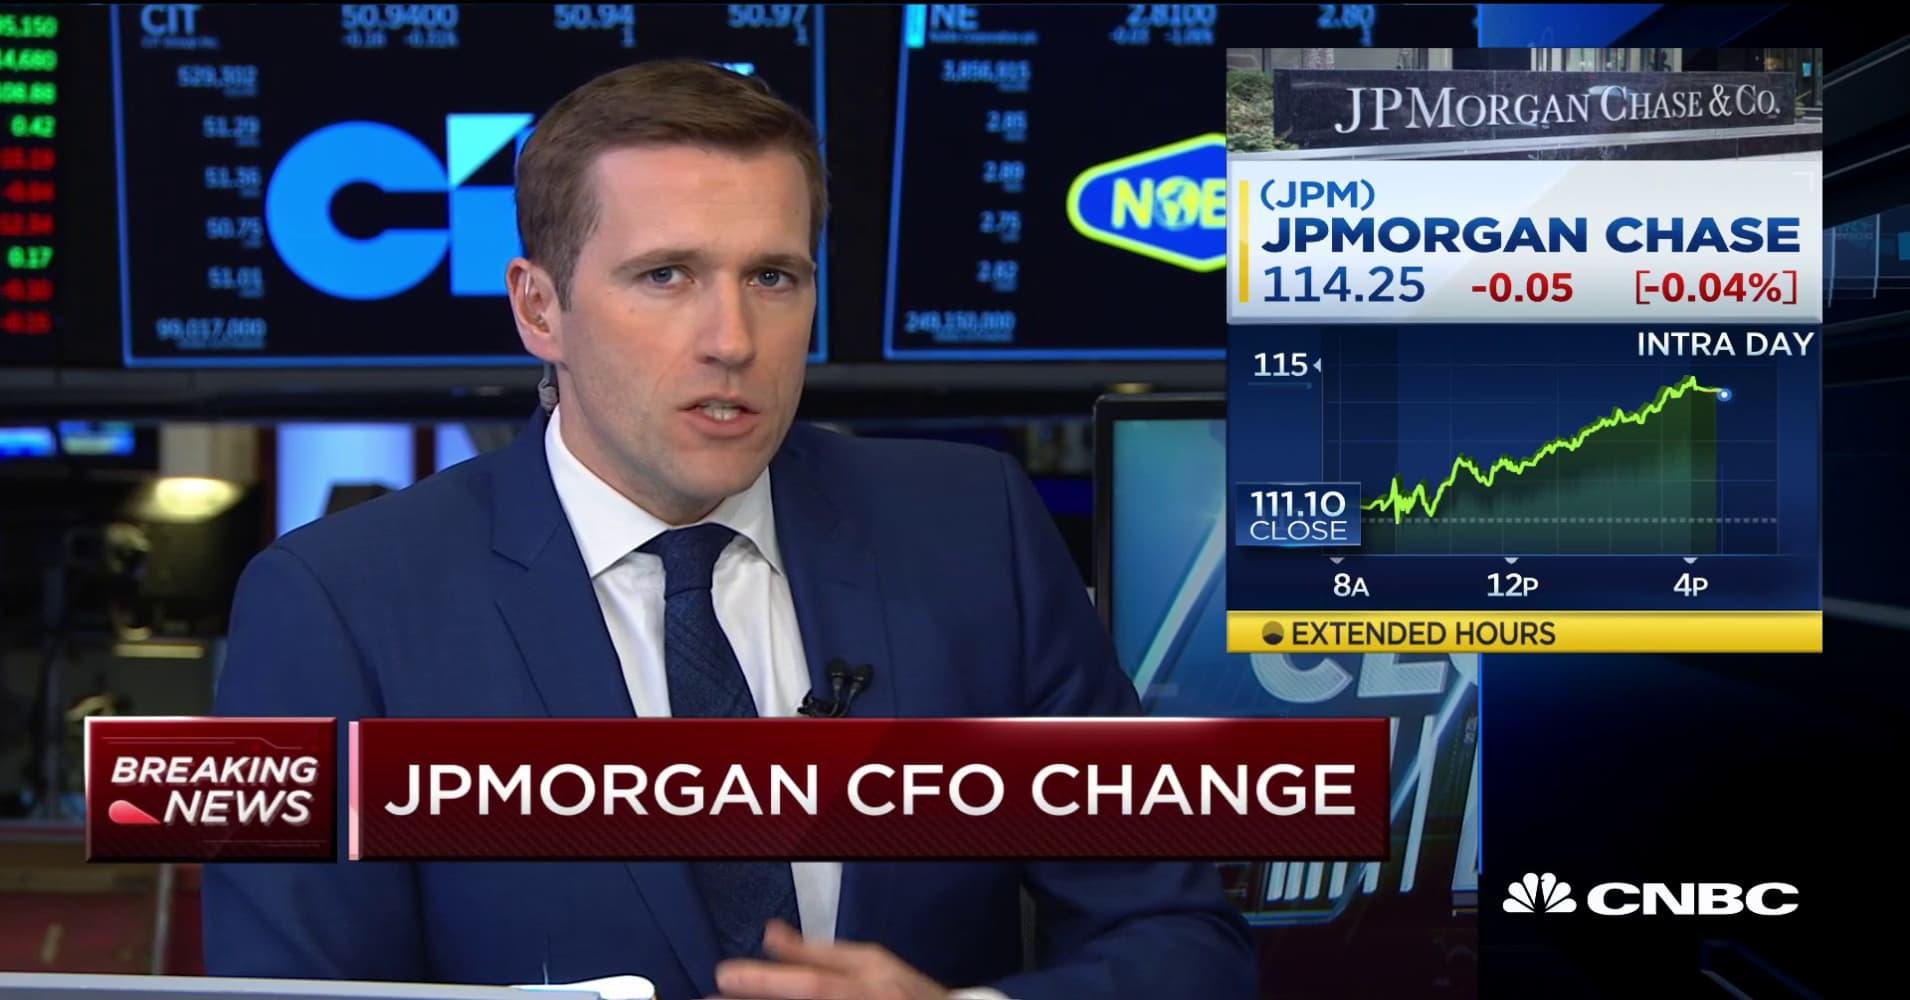 JP Morgan CFO to take on top consumer lending role